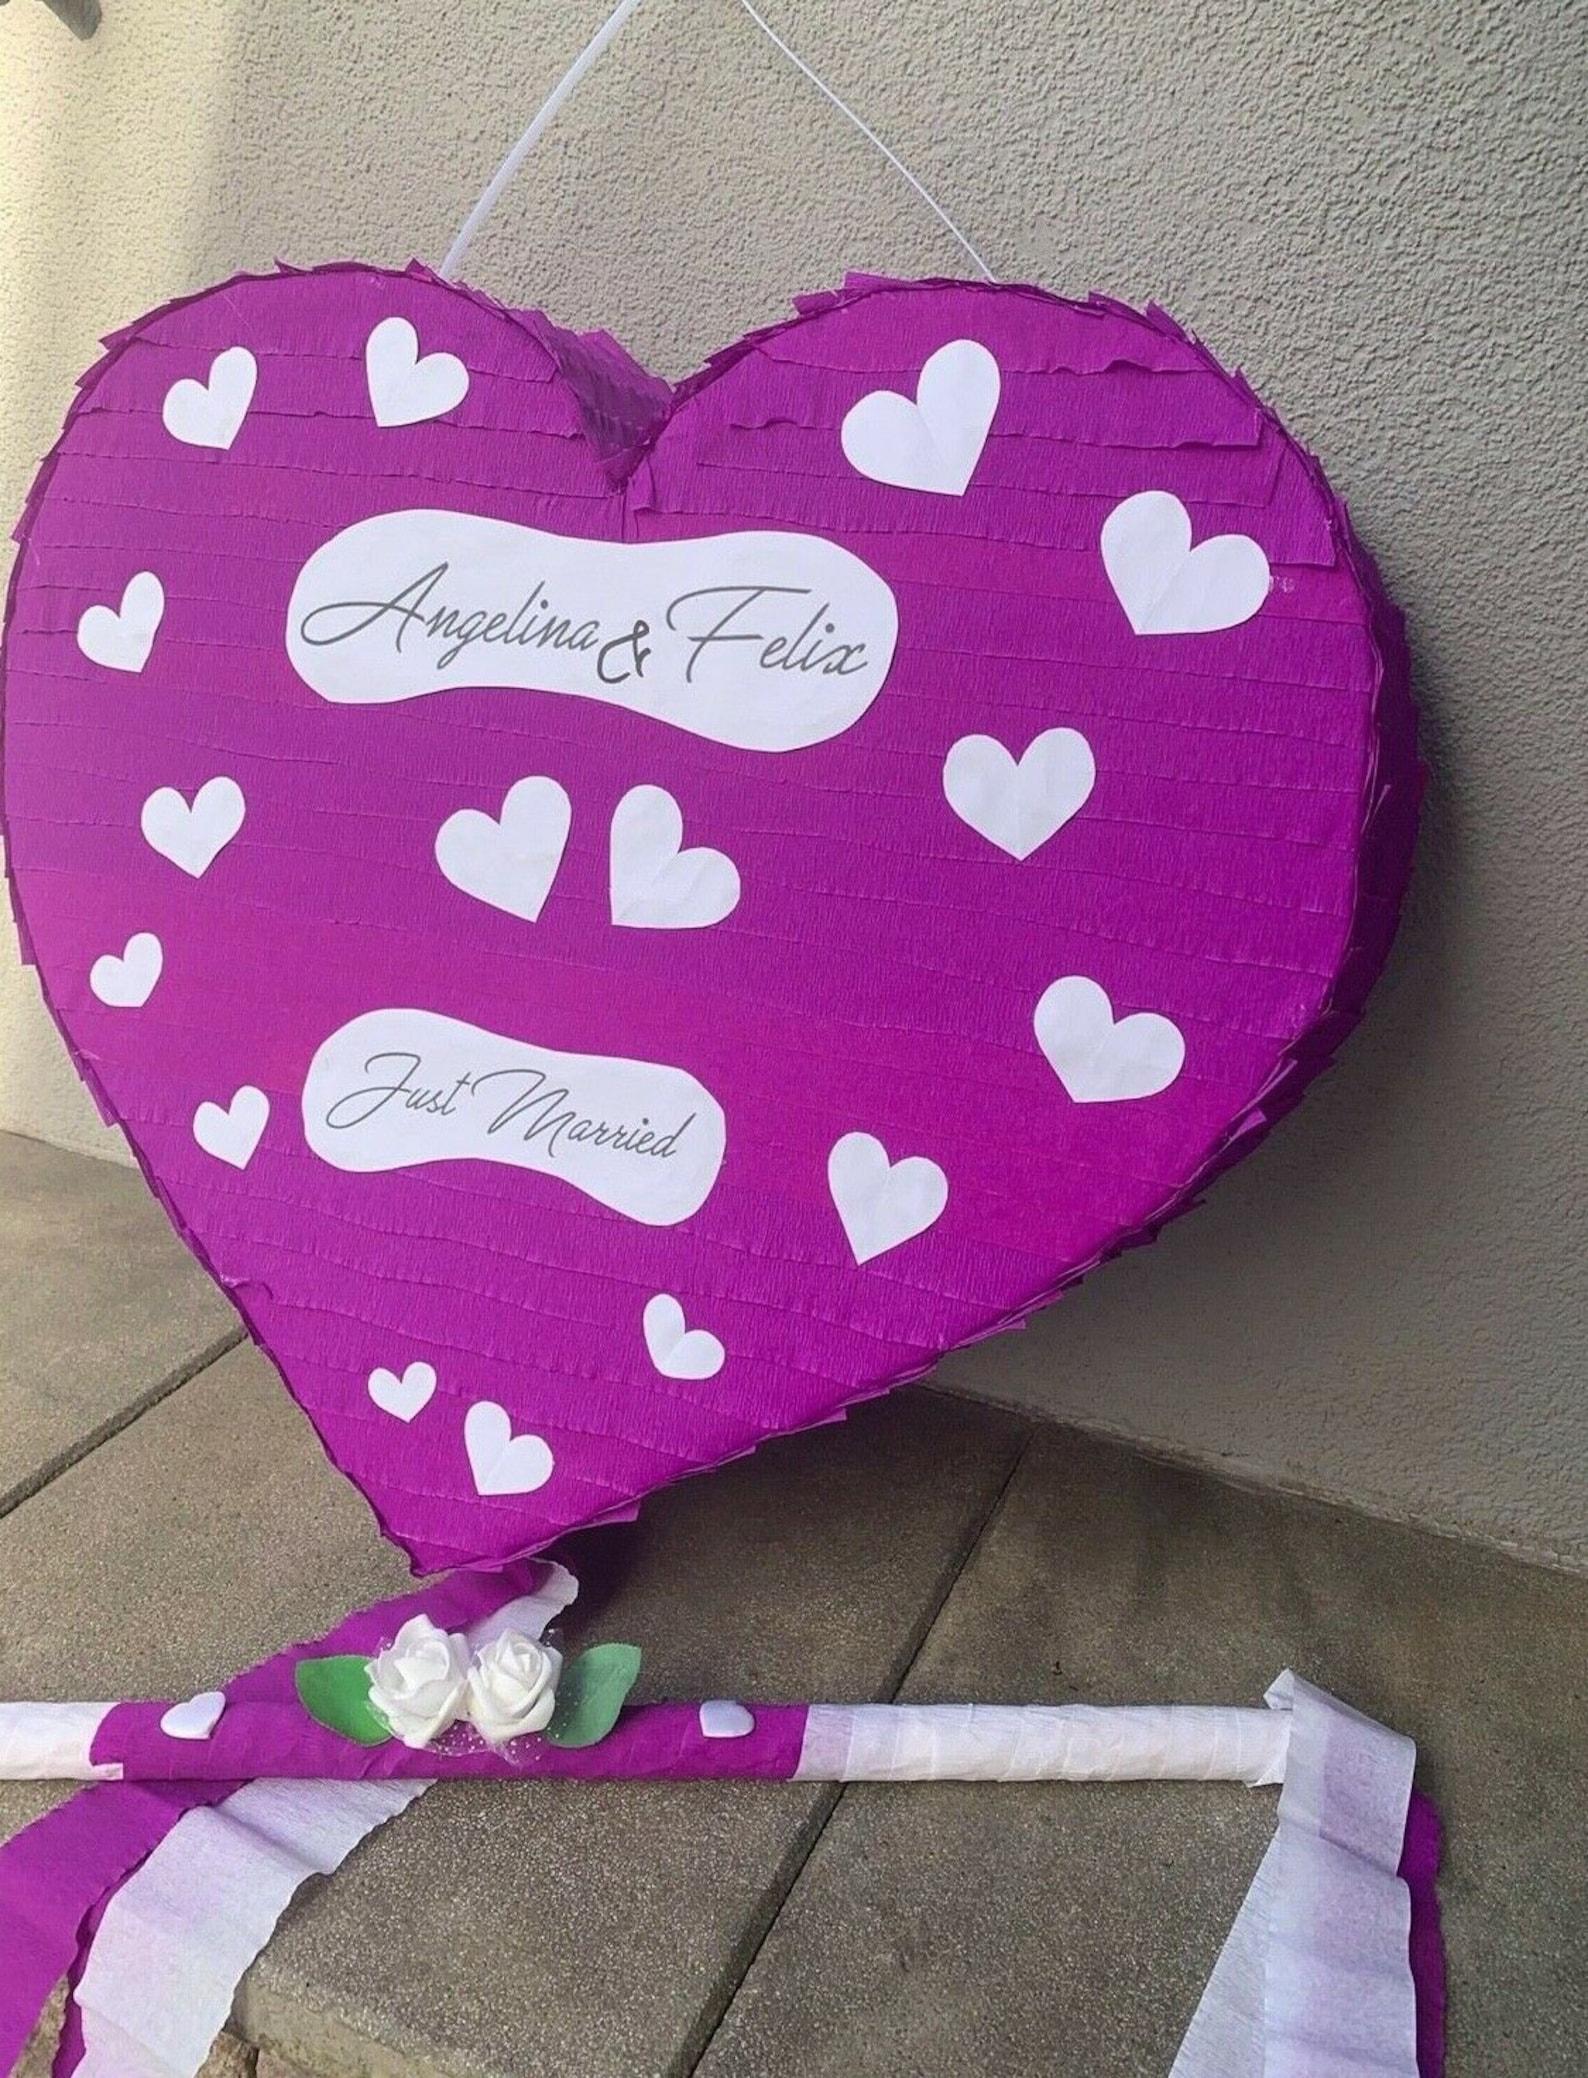 pinata heart xxl wedding birthday money gift 60 x 55 cm